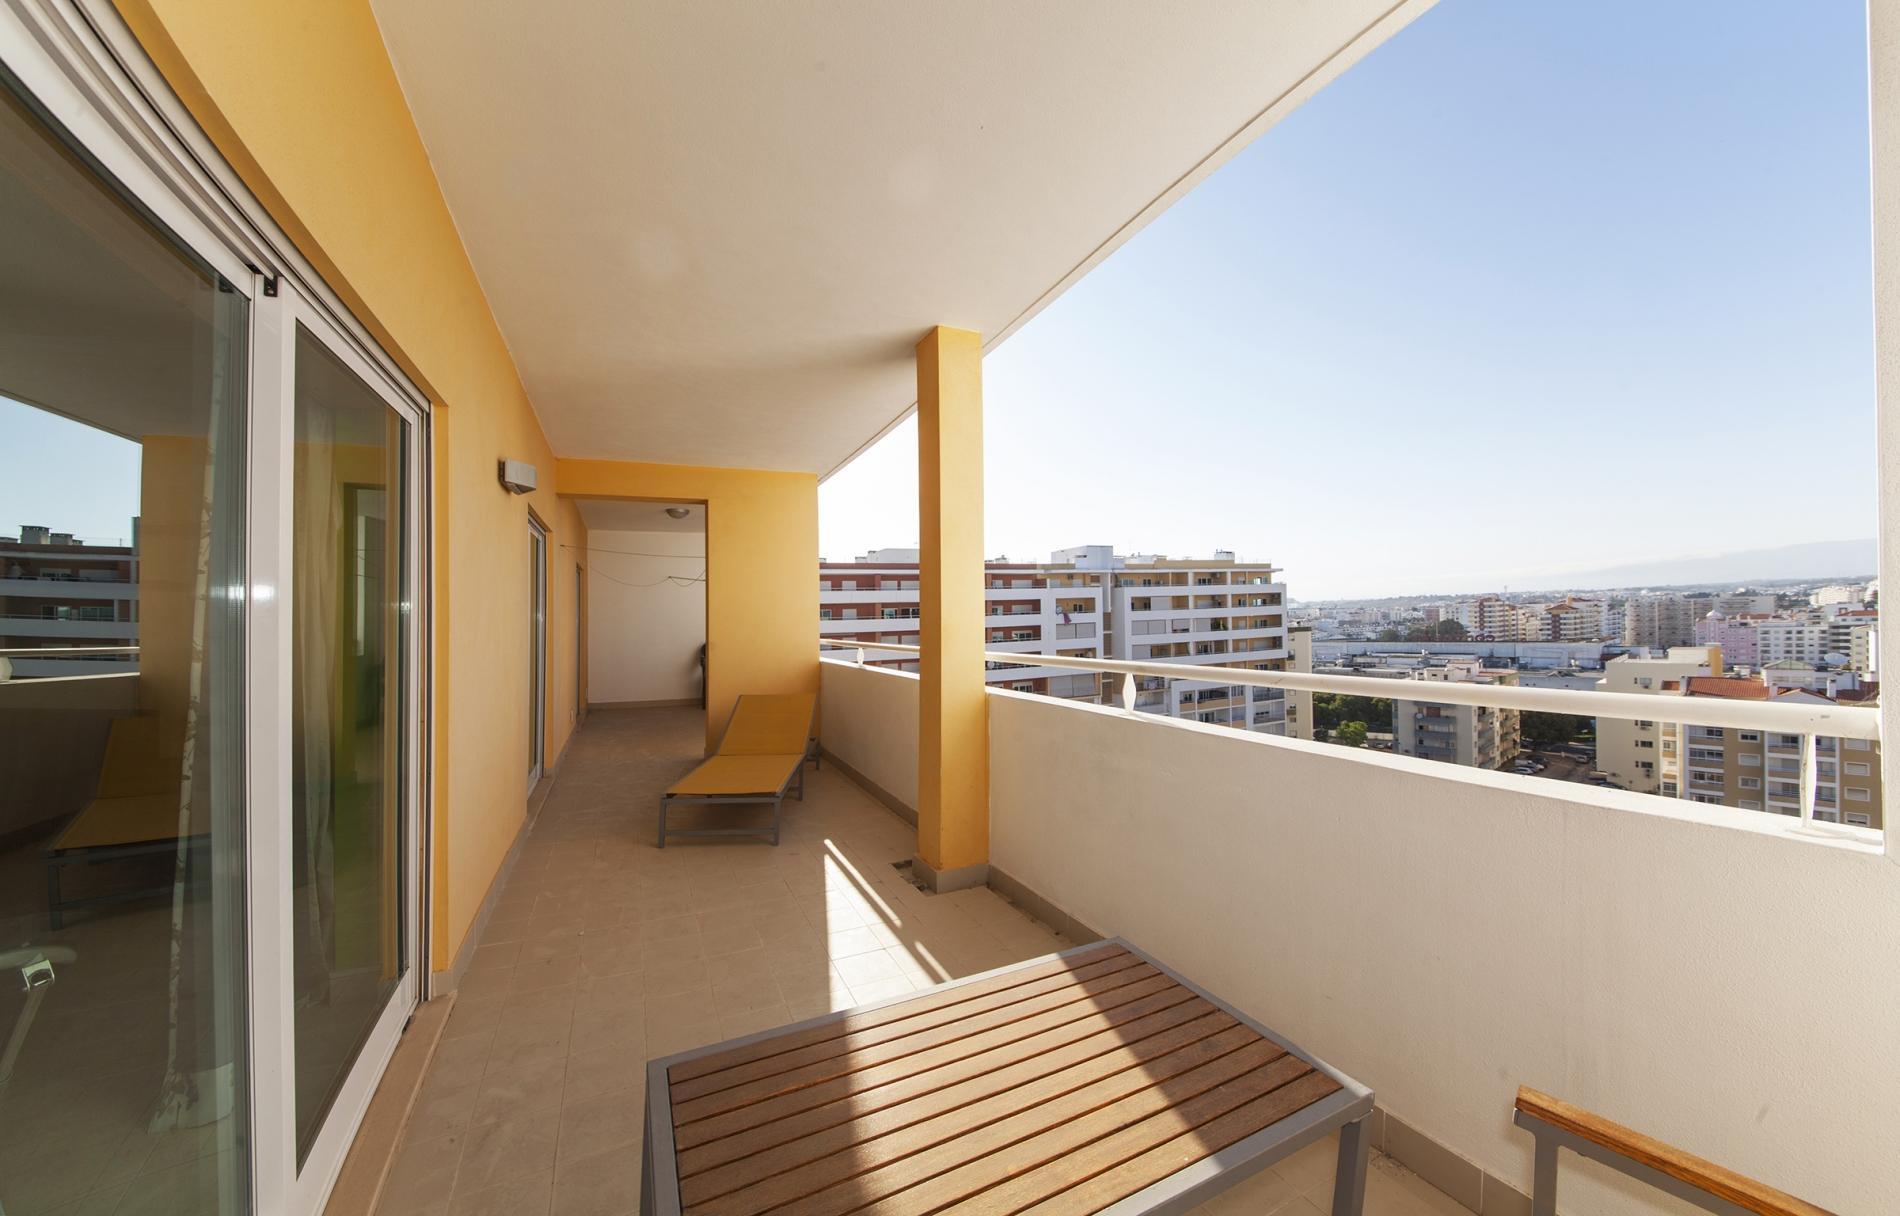 B44 - Alto do Quintao Central Apartment photo 22522533